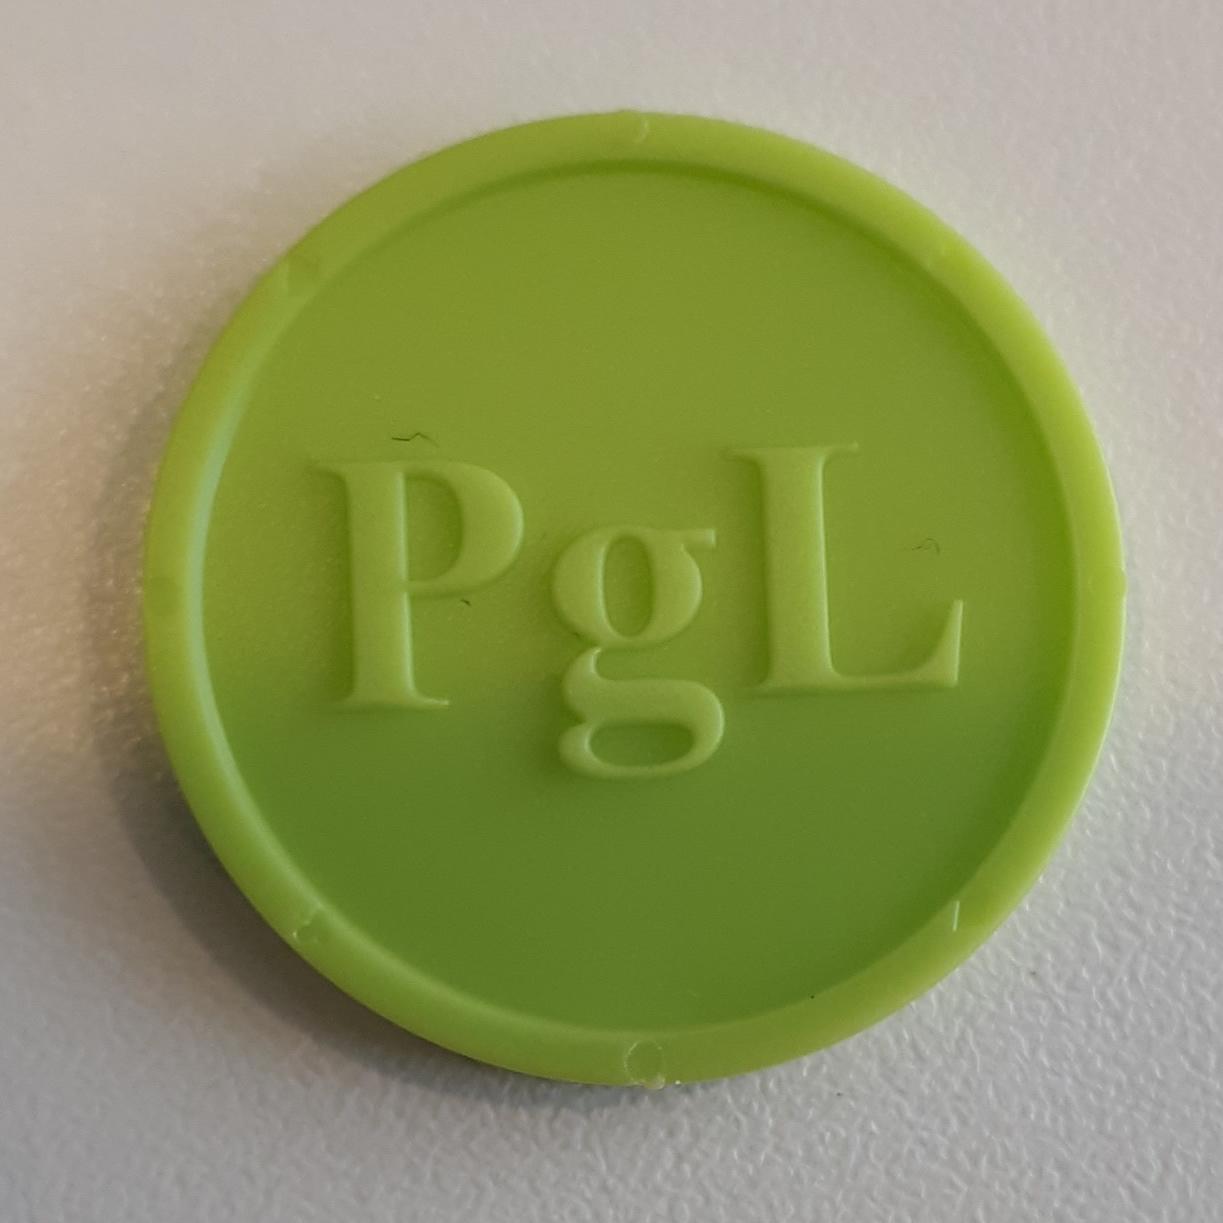 collectemunt-groen-pgl